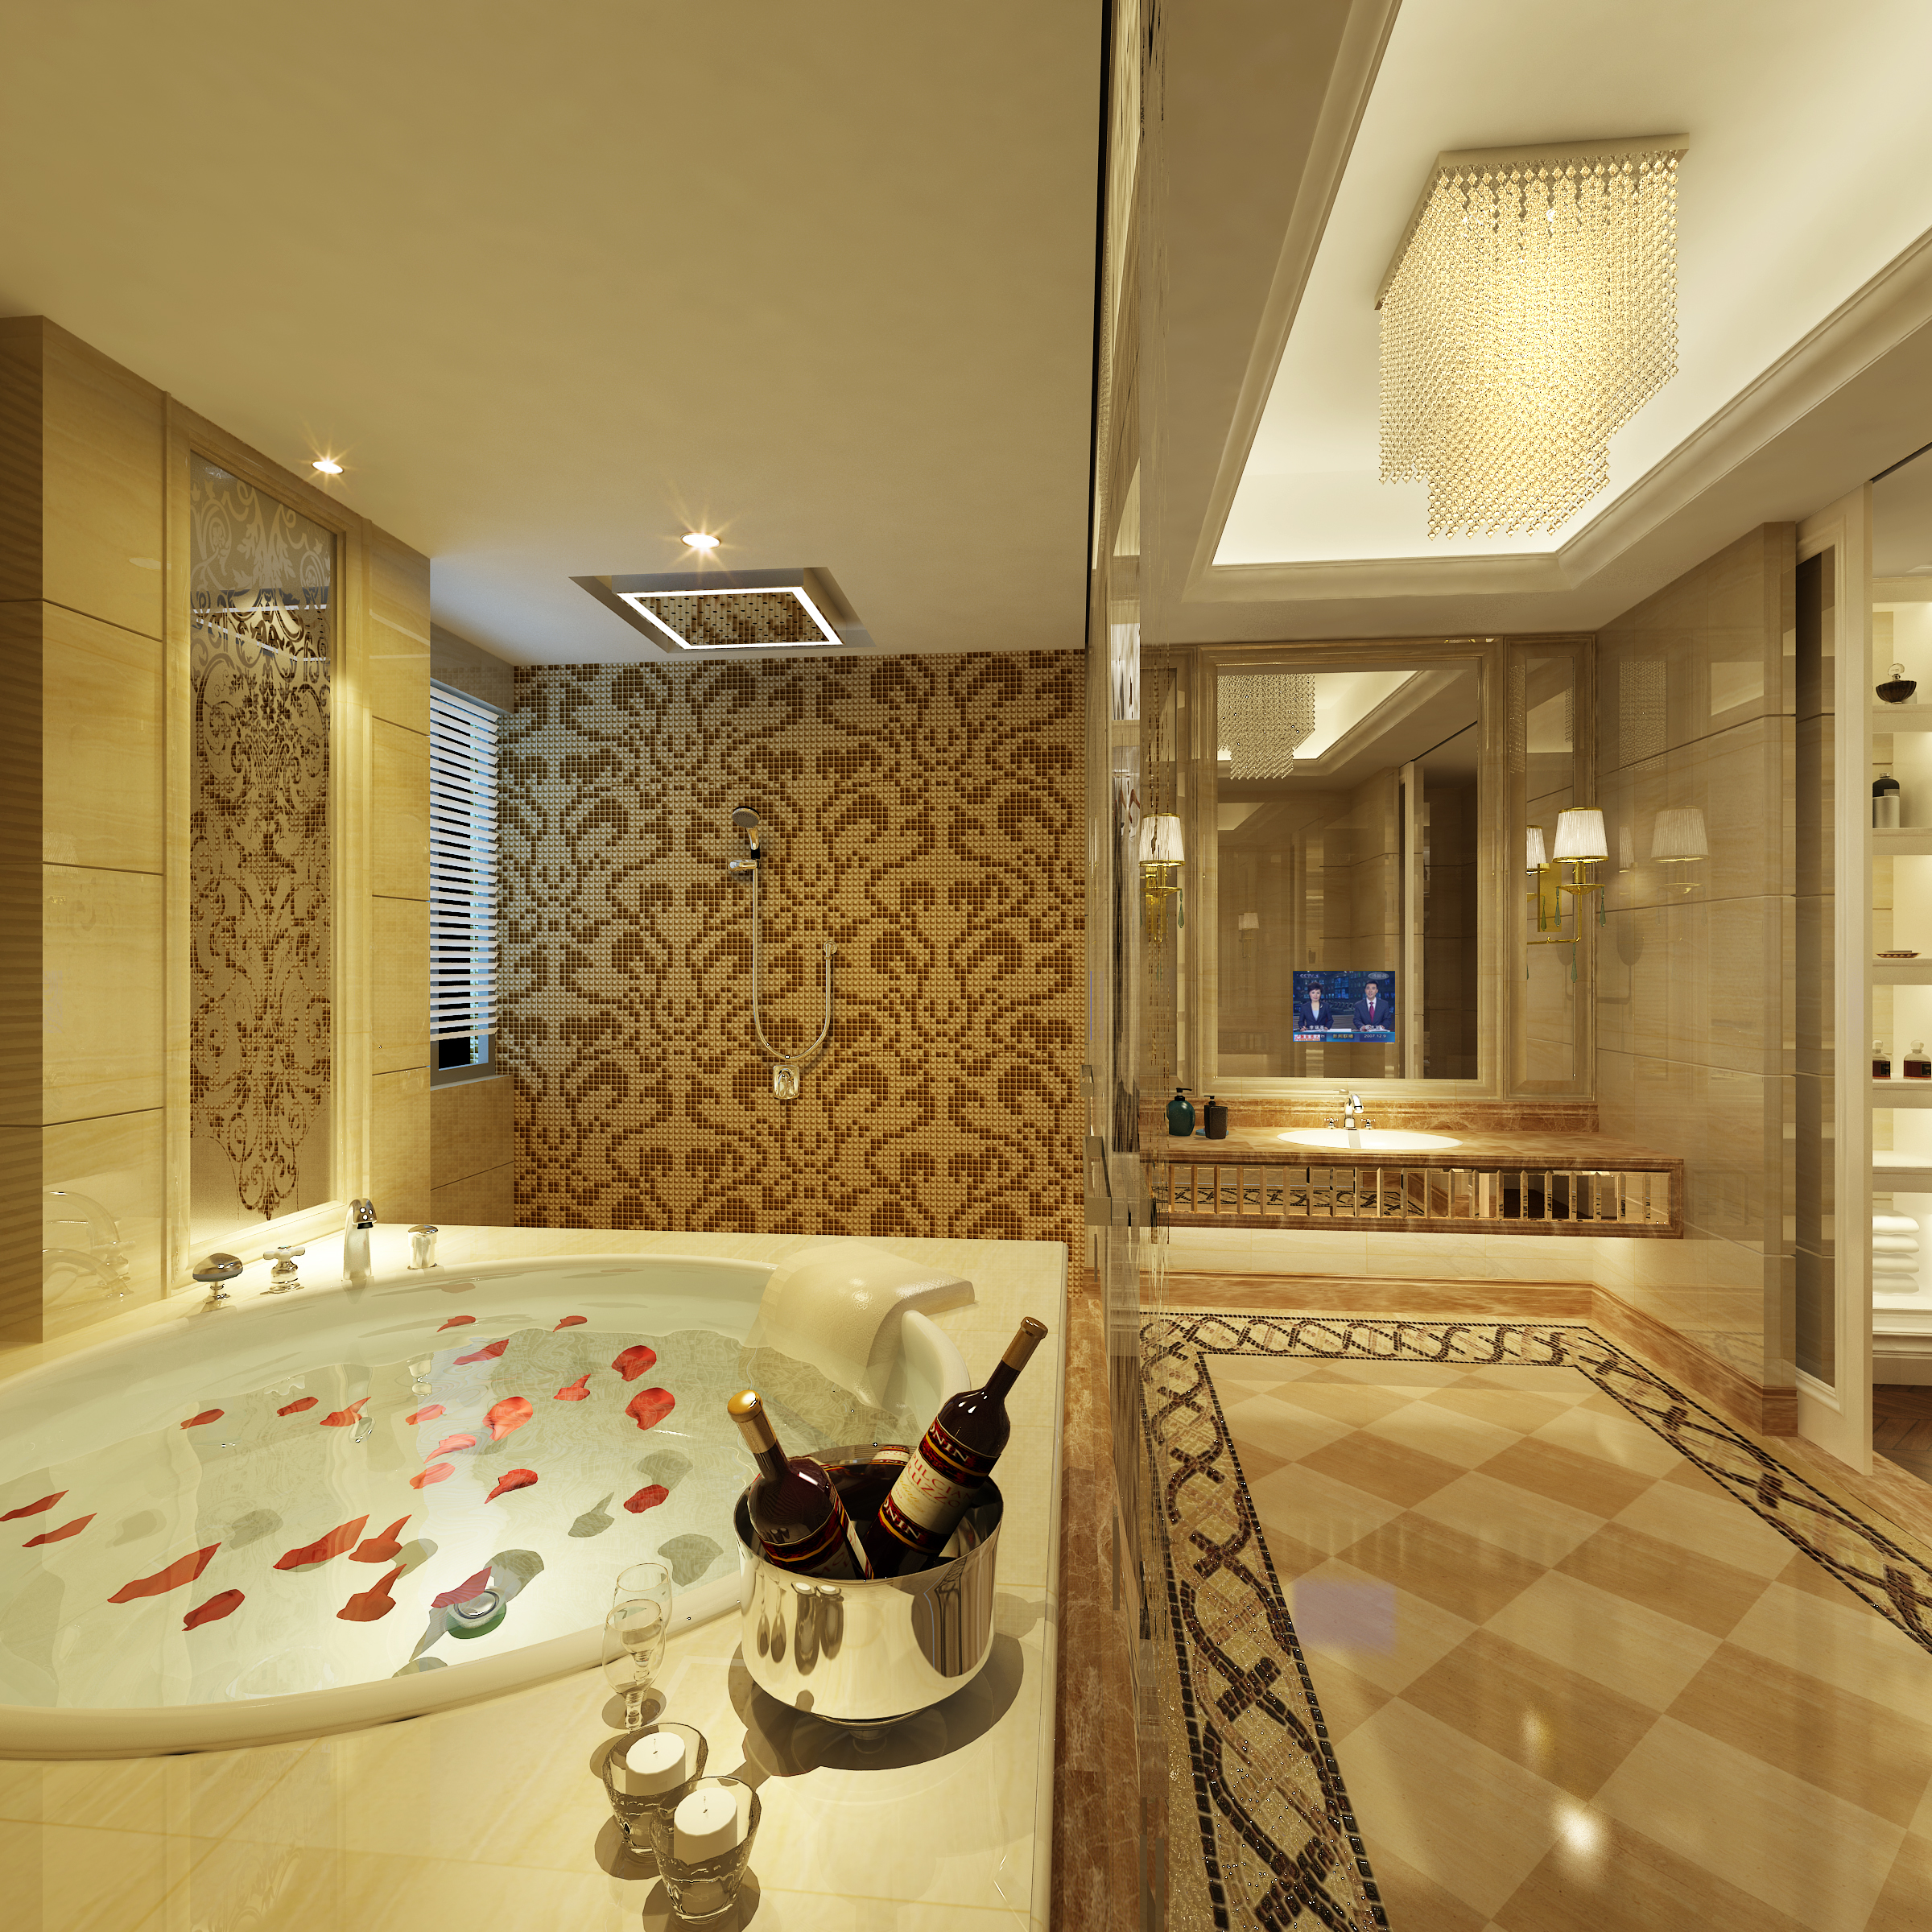 Bathroom Model 3d bathroom floors. 3d tiles for bathroom astonishing 3d designs